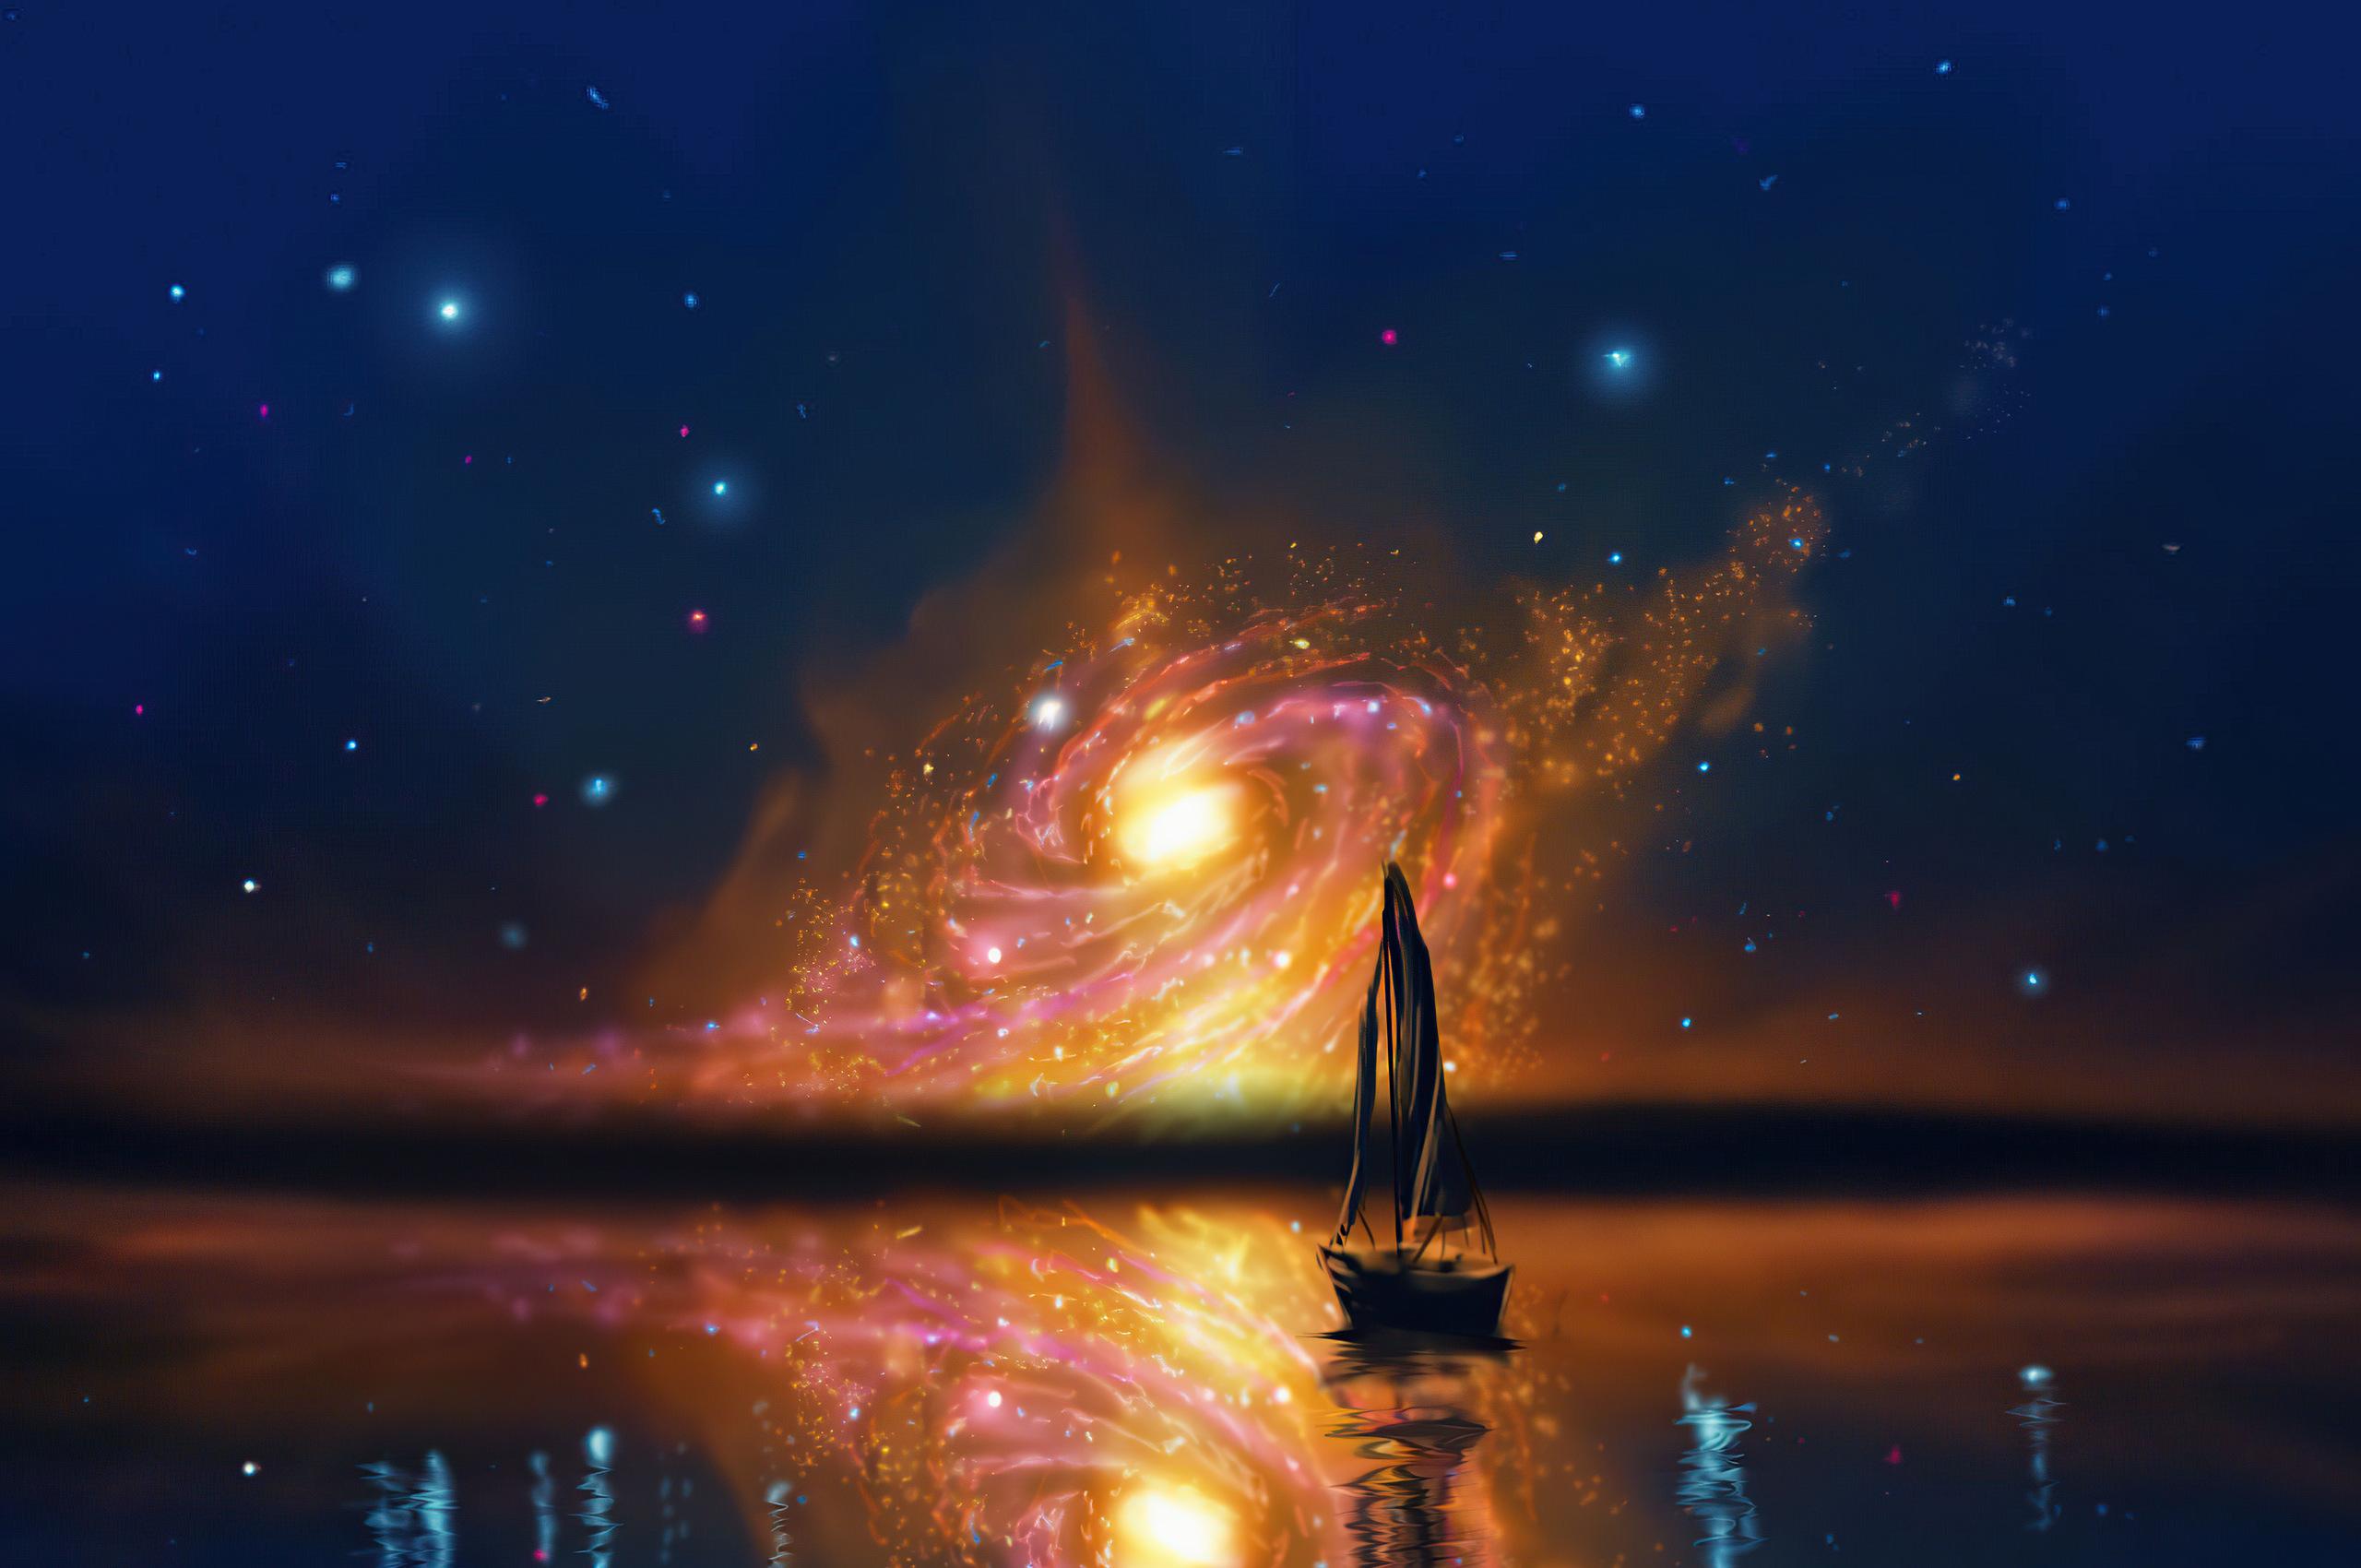 astronomy-exo-planet-boat-scenery-5k-sp.jpg